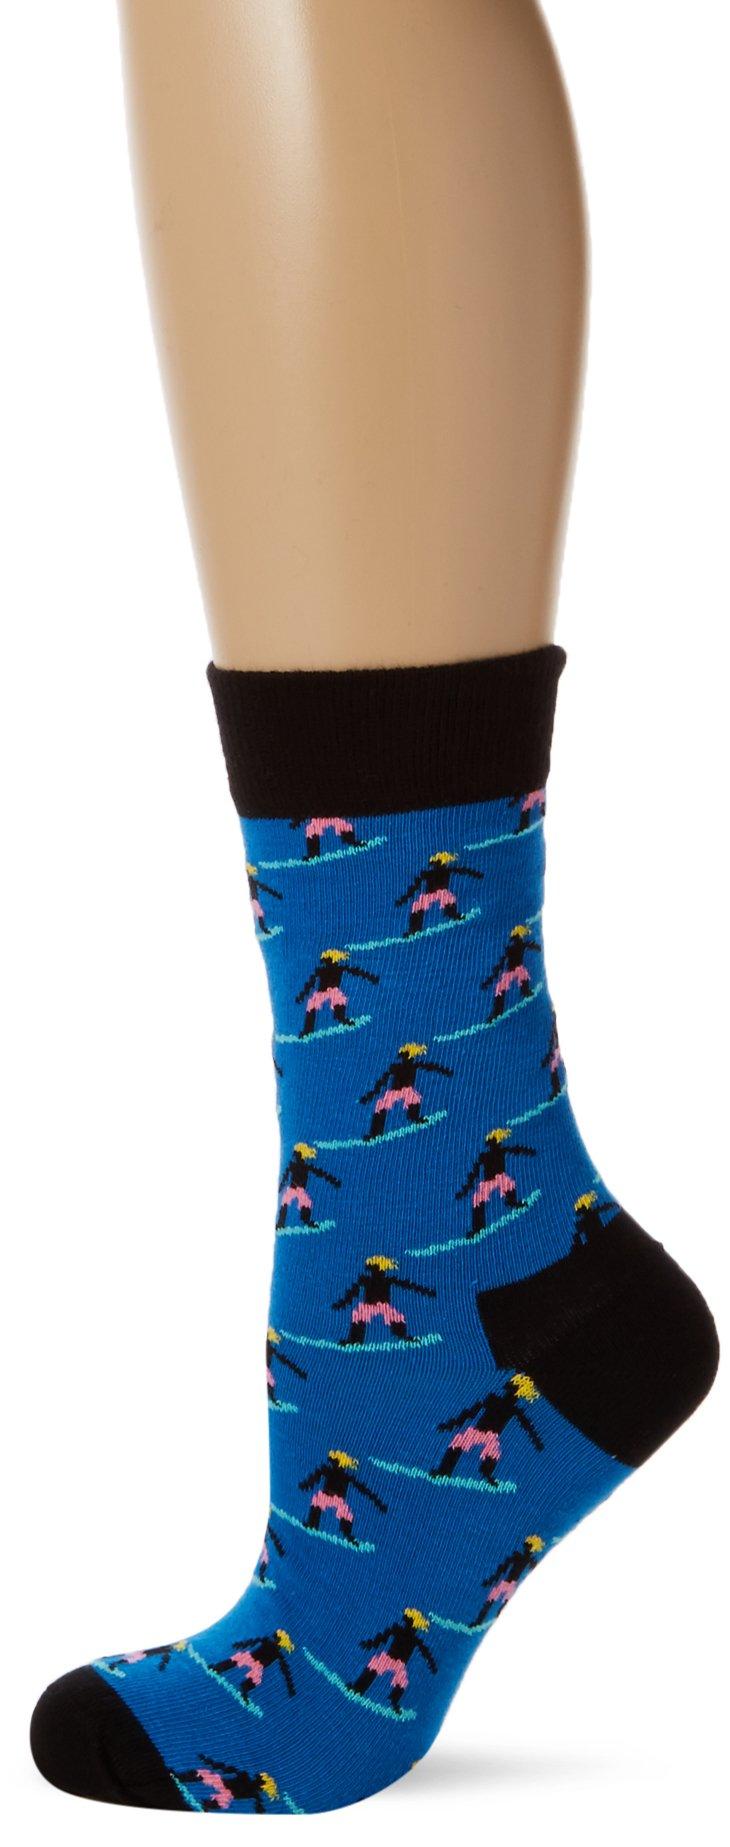 Happy Socks Surfer Sock, Calcetines para Mujer, Multicolor, 37-40